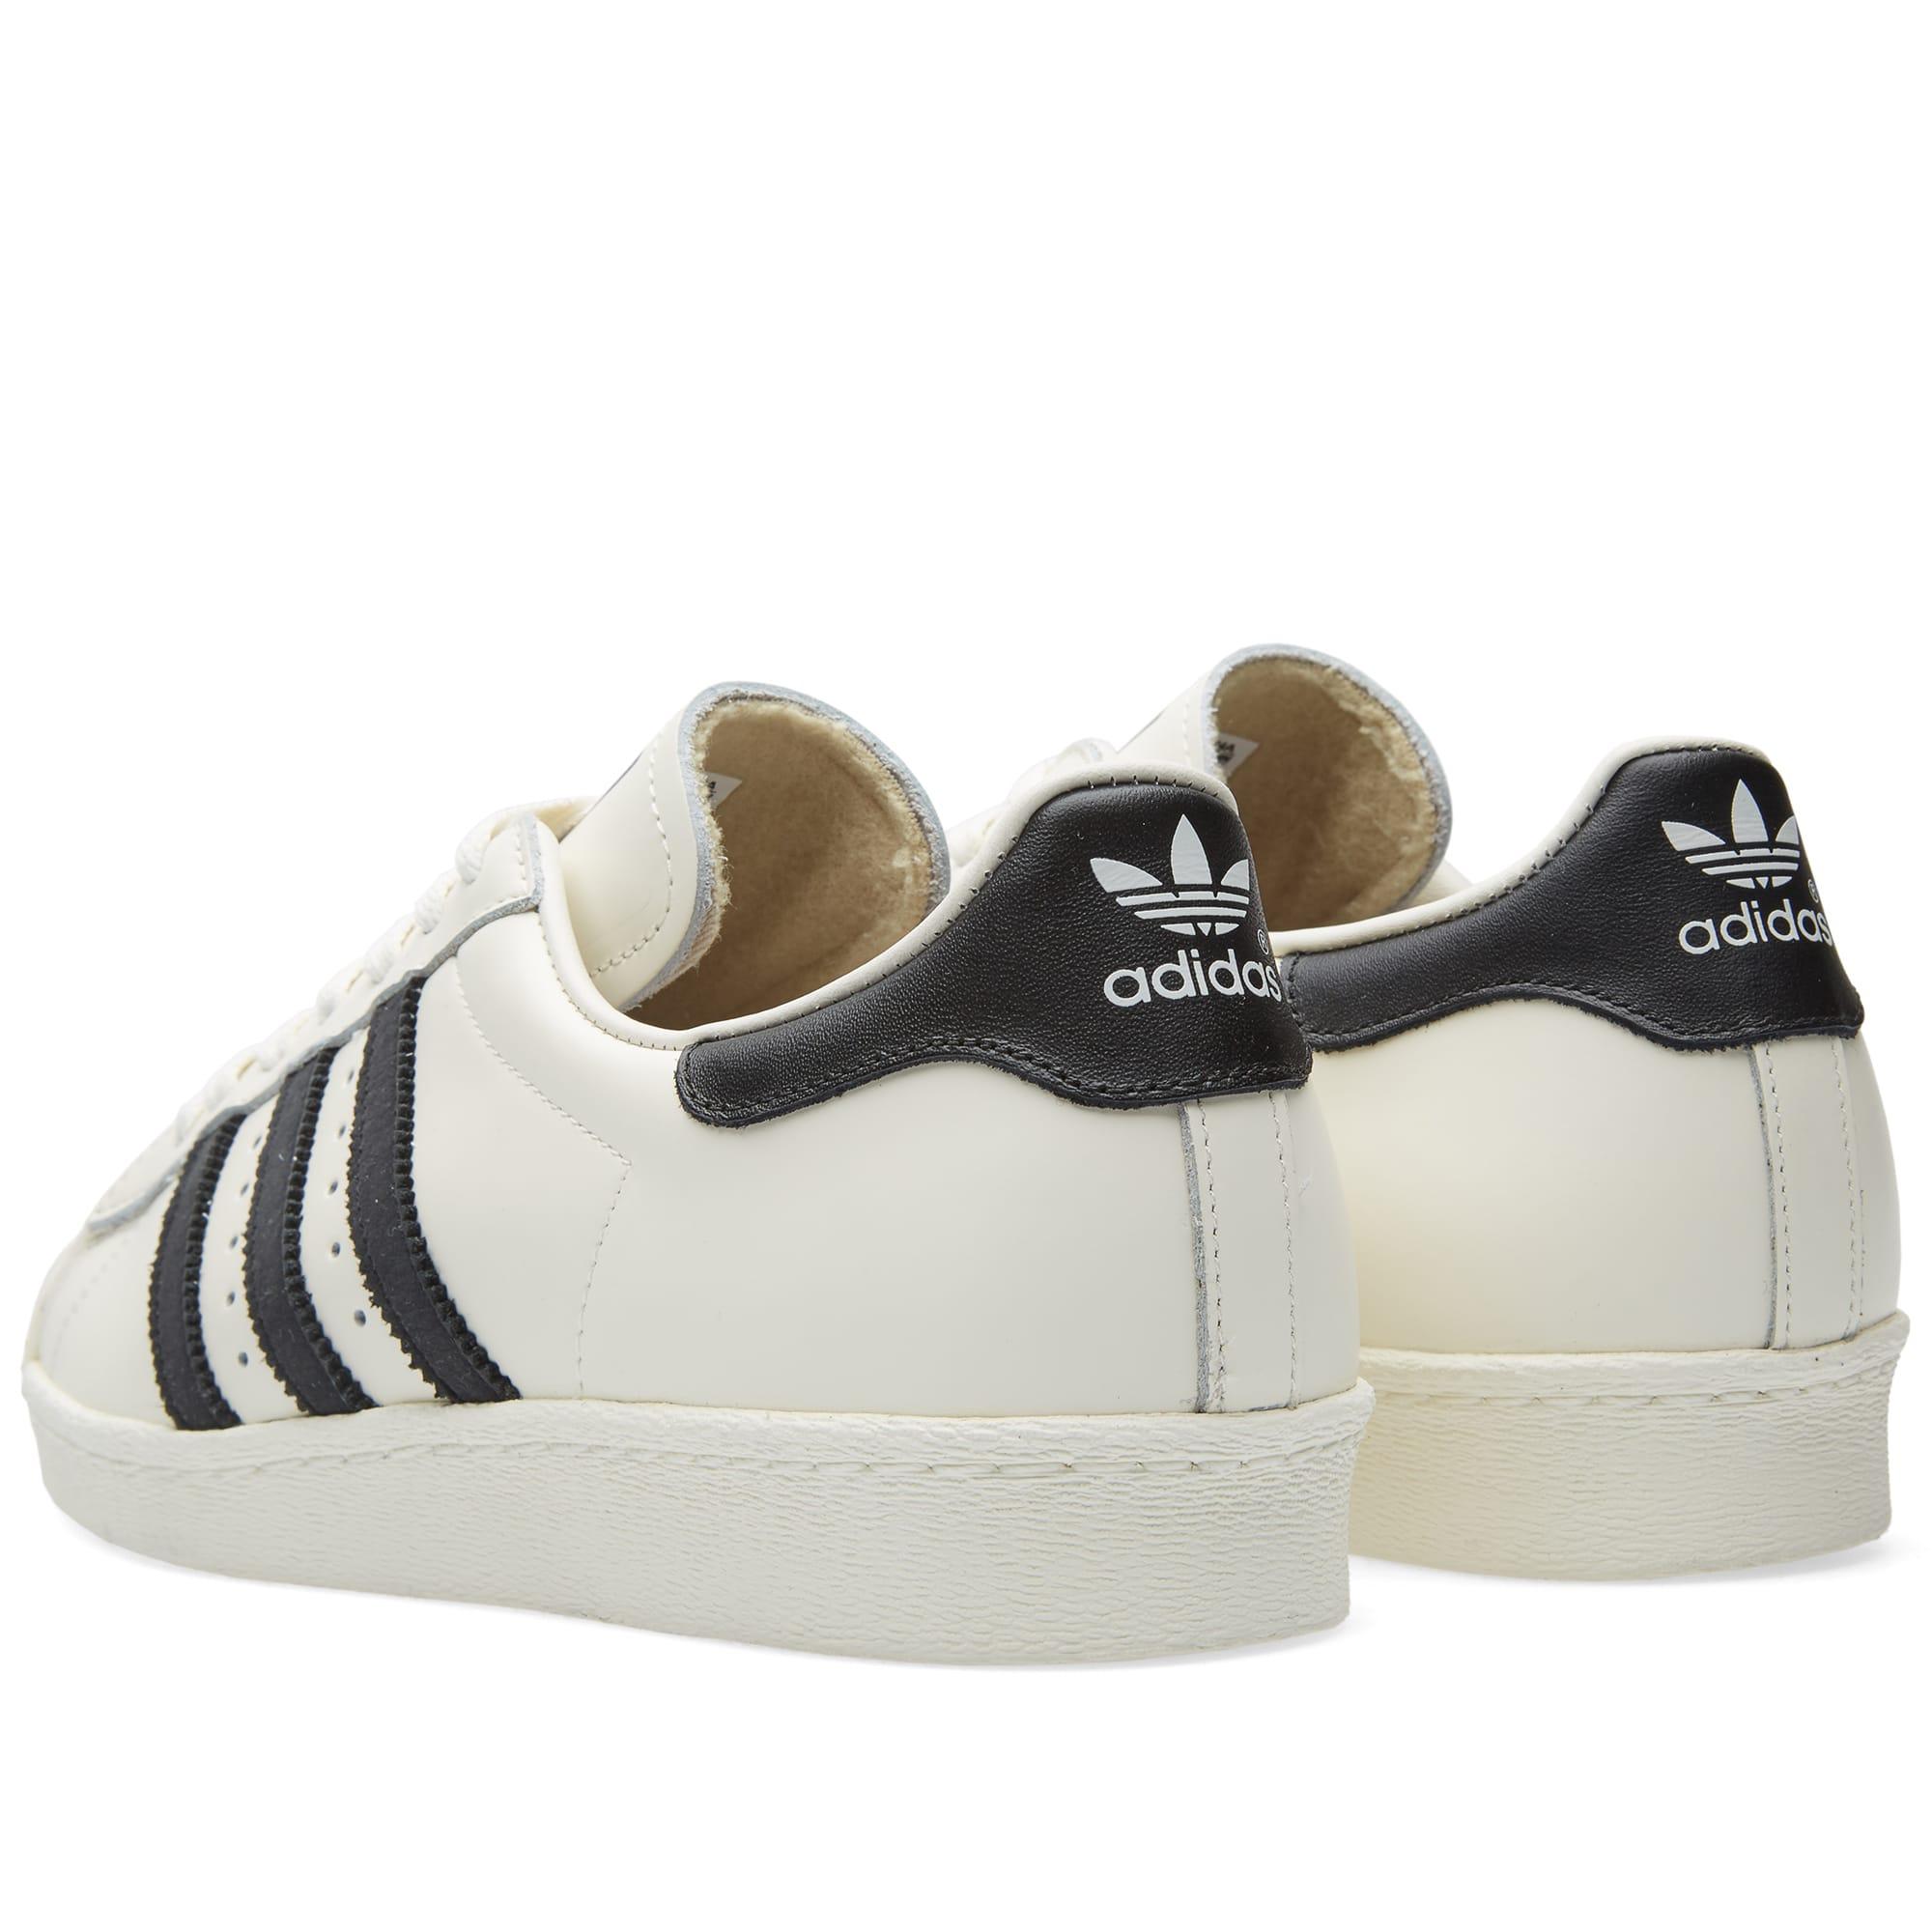 lowest price cc492 581bf Adidas Superstar 80s DLX